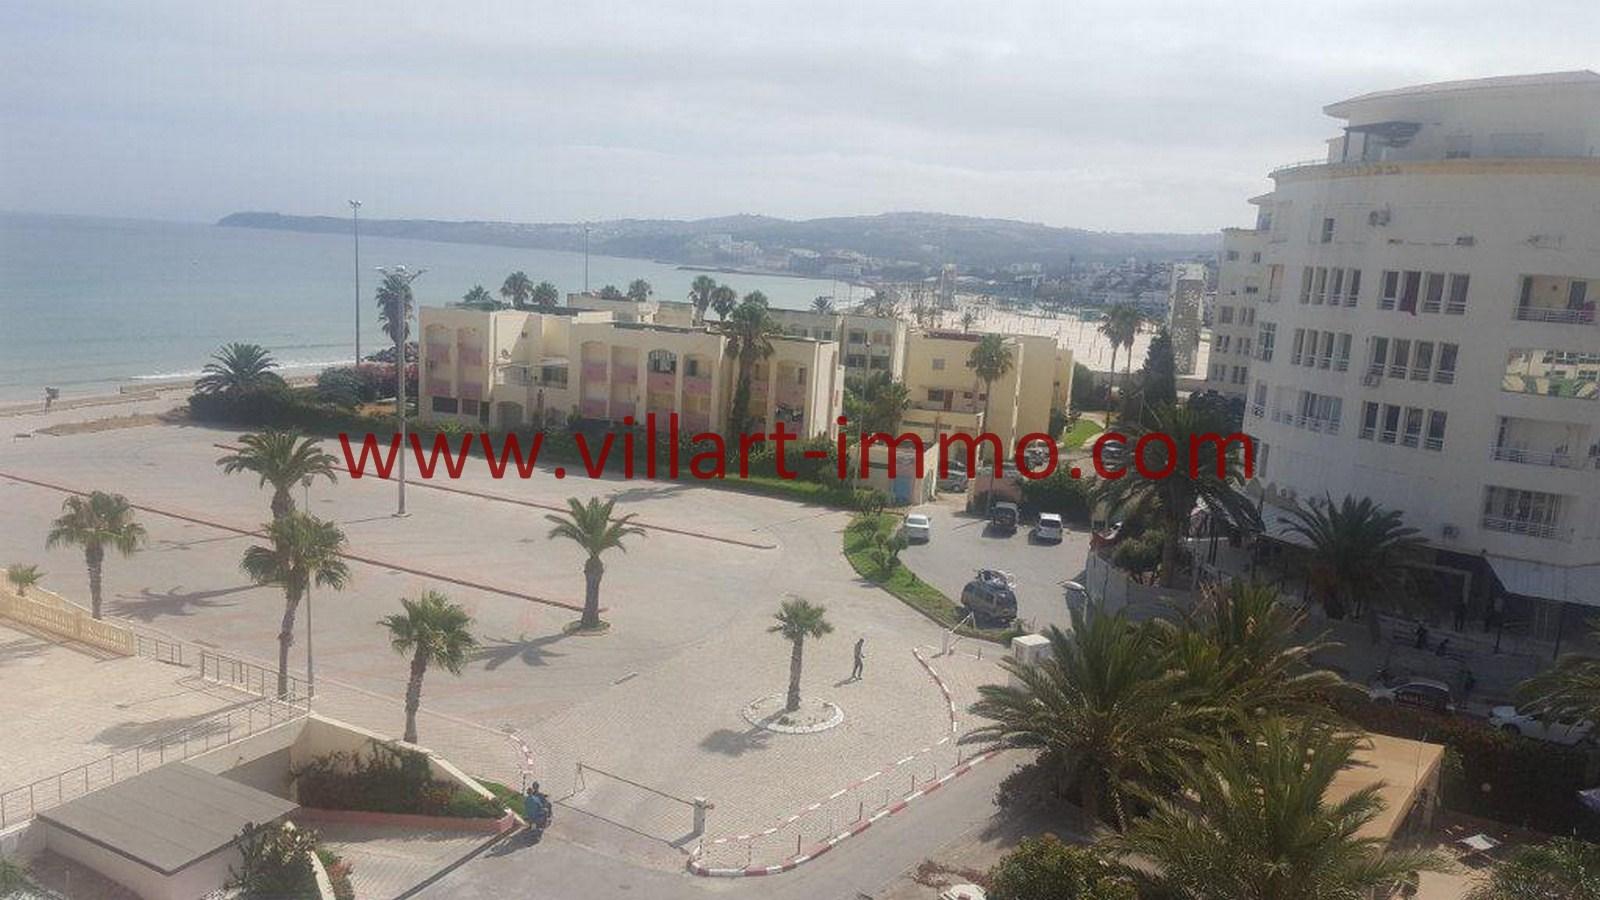 1-Vente-Appartement-Tanger-Malabata-Vue1-VA507-Villart Immo